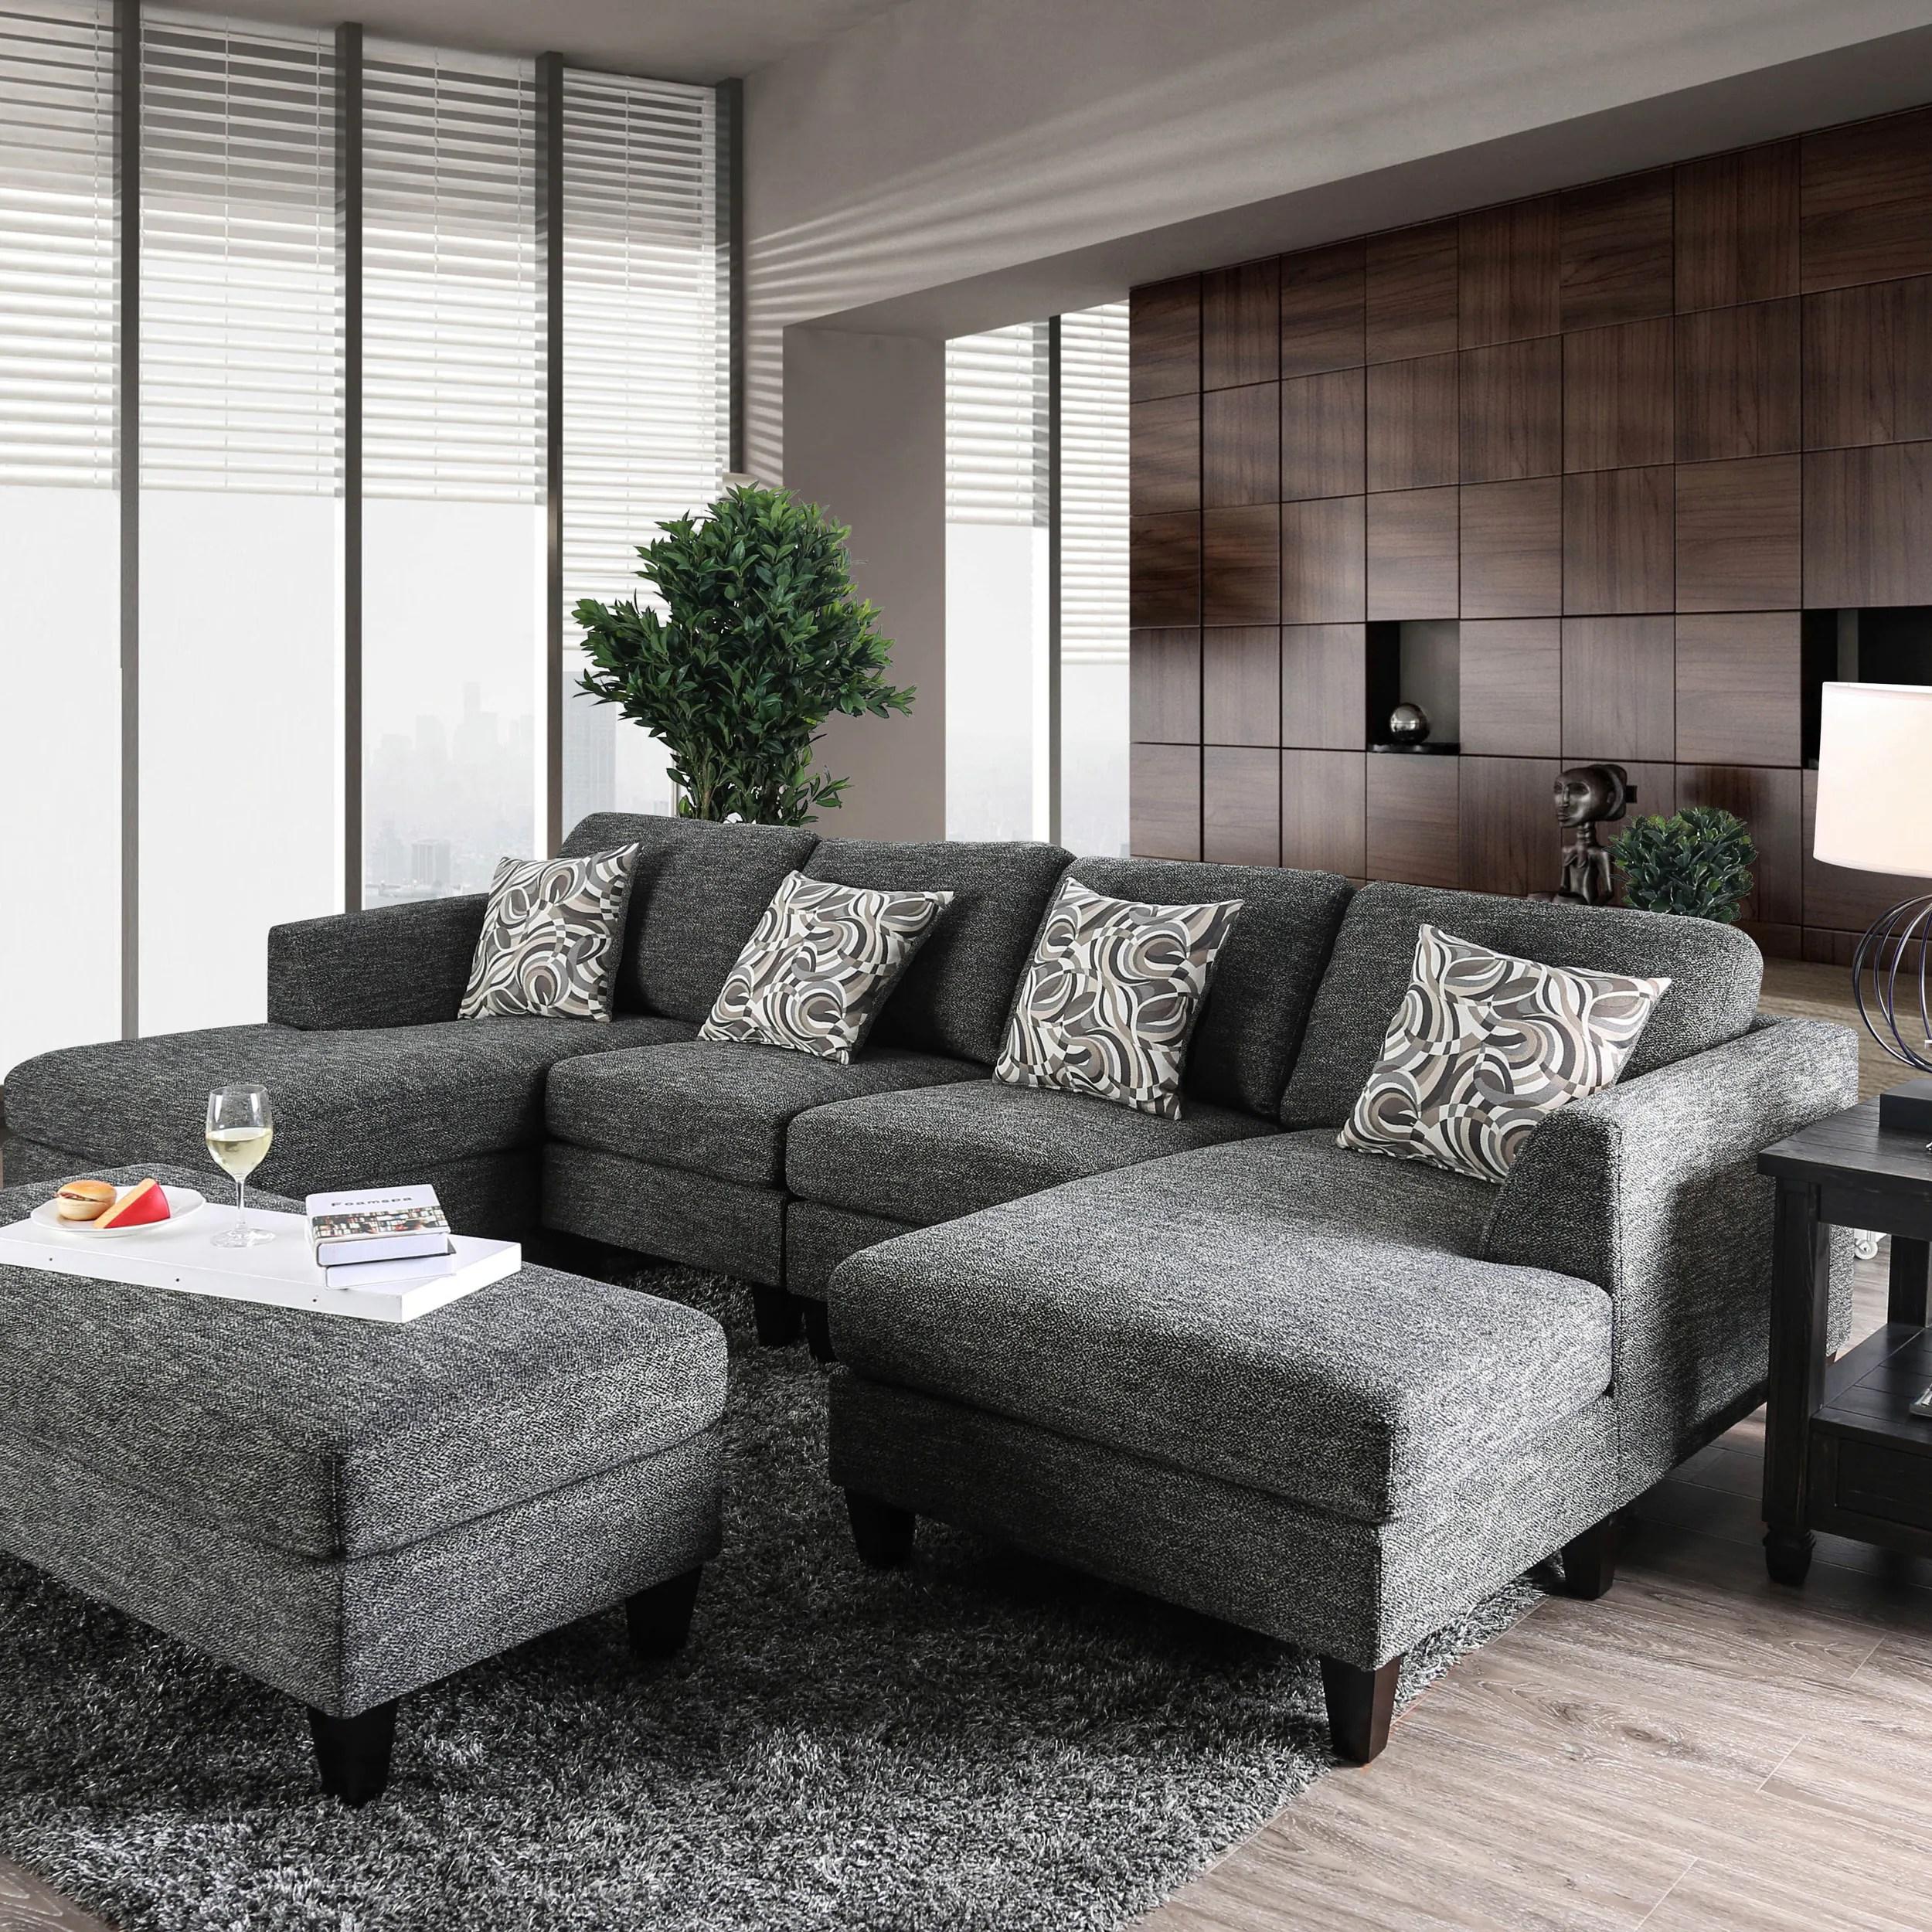 furniture of america lauf modern grey 4 piece modular sectional